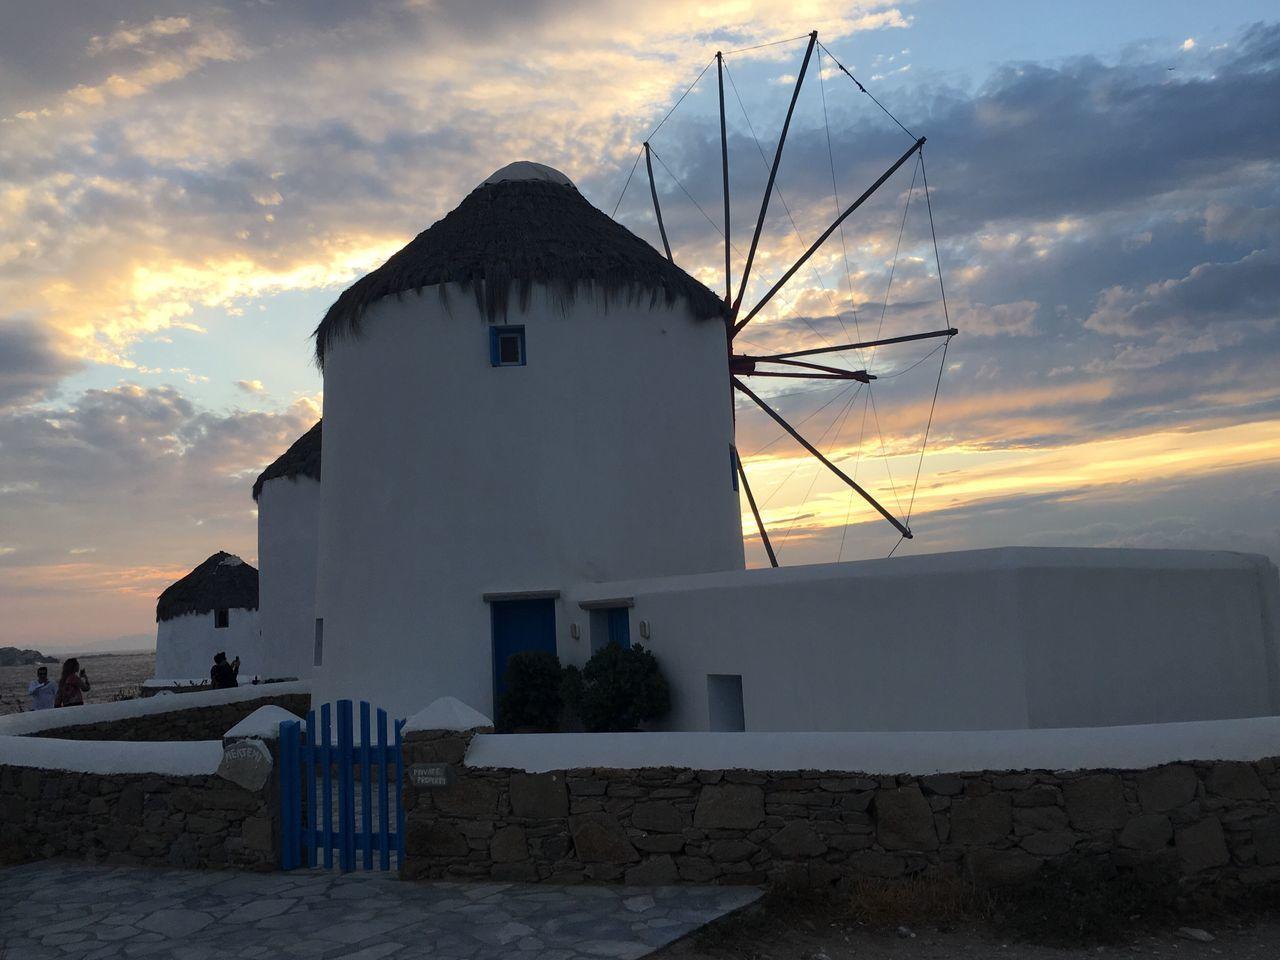 Windmill Destination Cyclades Islands Travelphotography Love Traveling Best Destination Traveling Mykonostown Mykonos,Greece